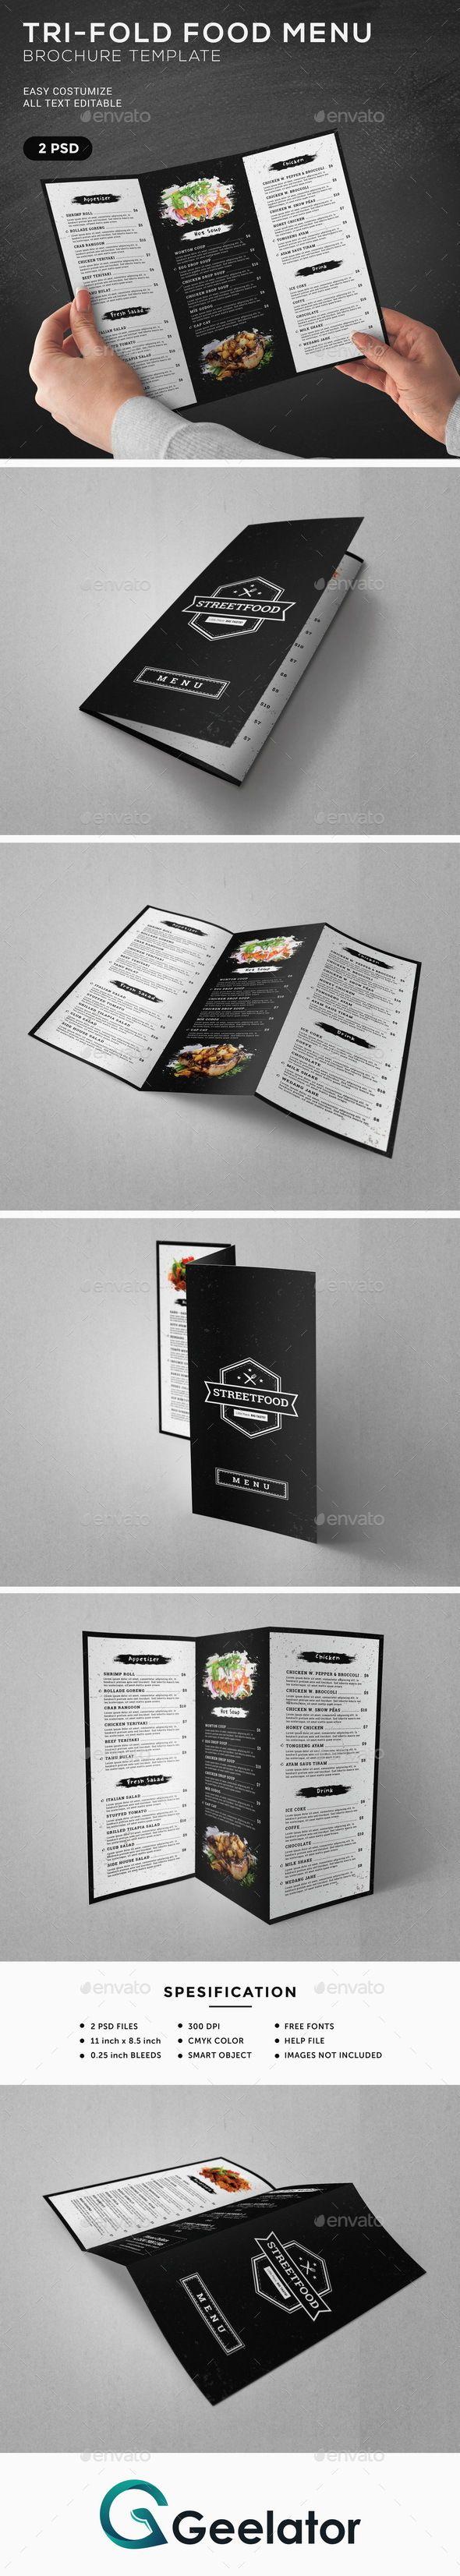 best restaurants images on pinterest burger bar burgers and